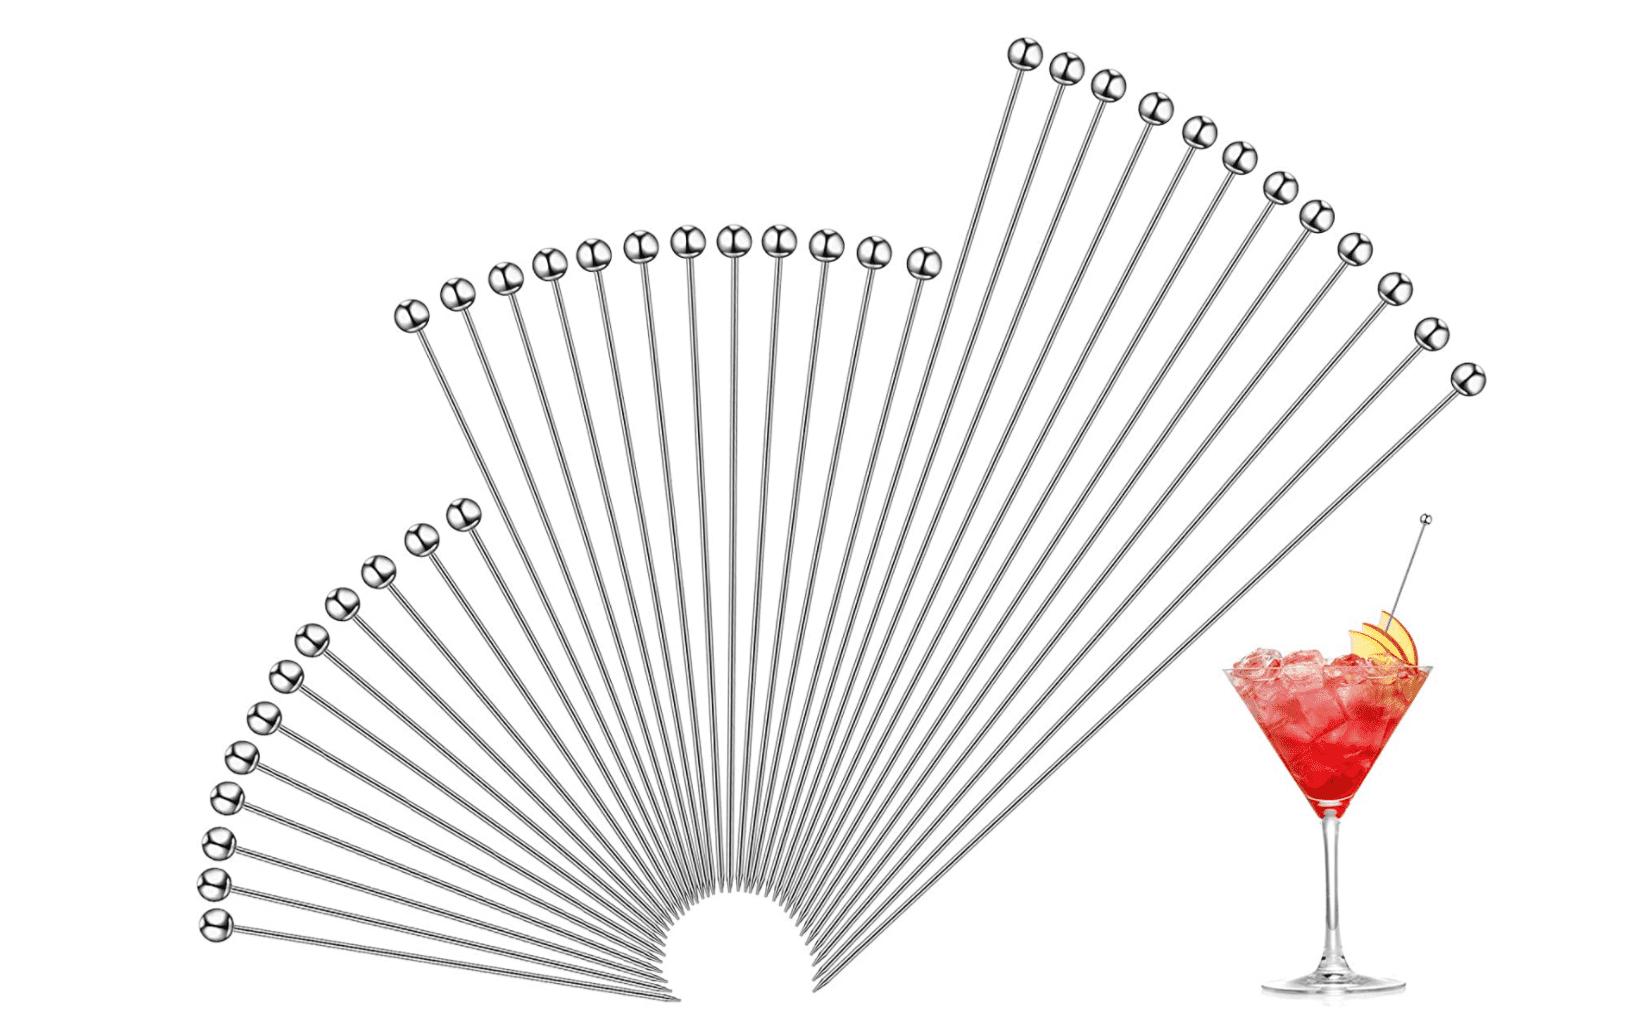 35 Piece Cocktail Picks